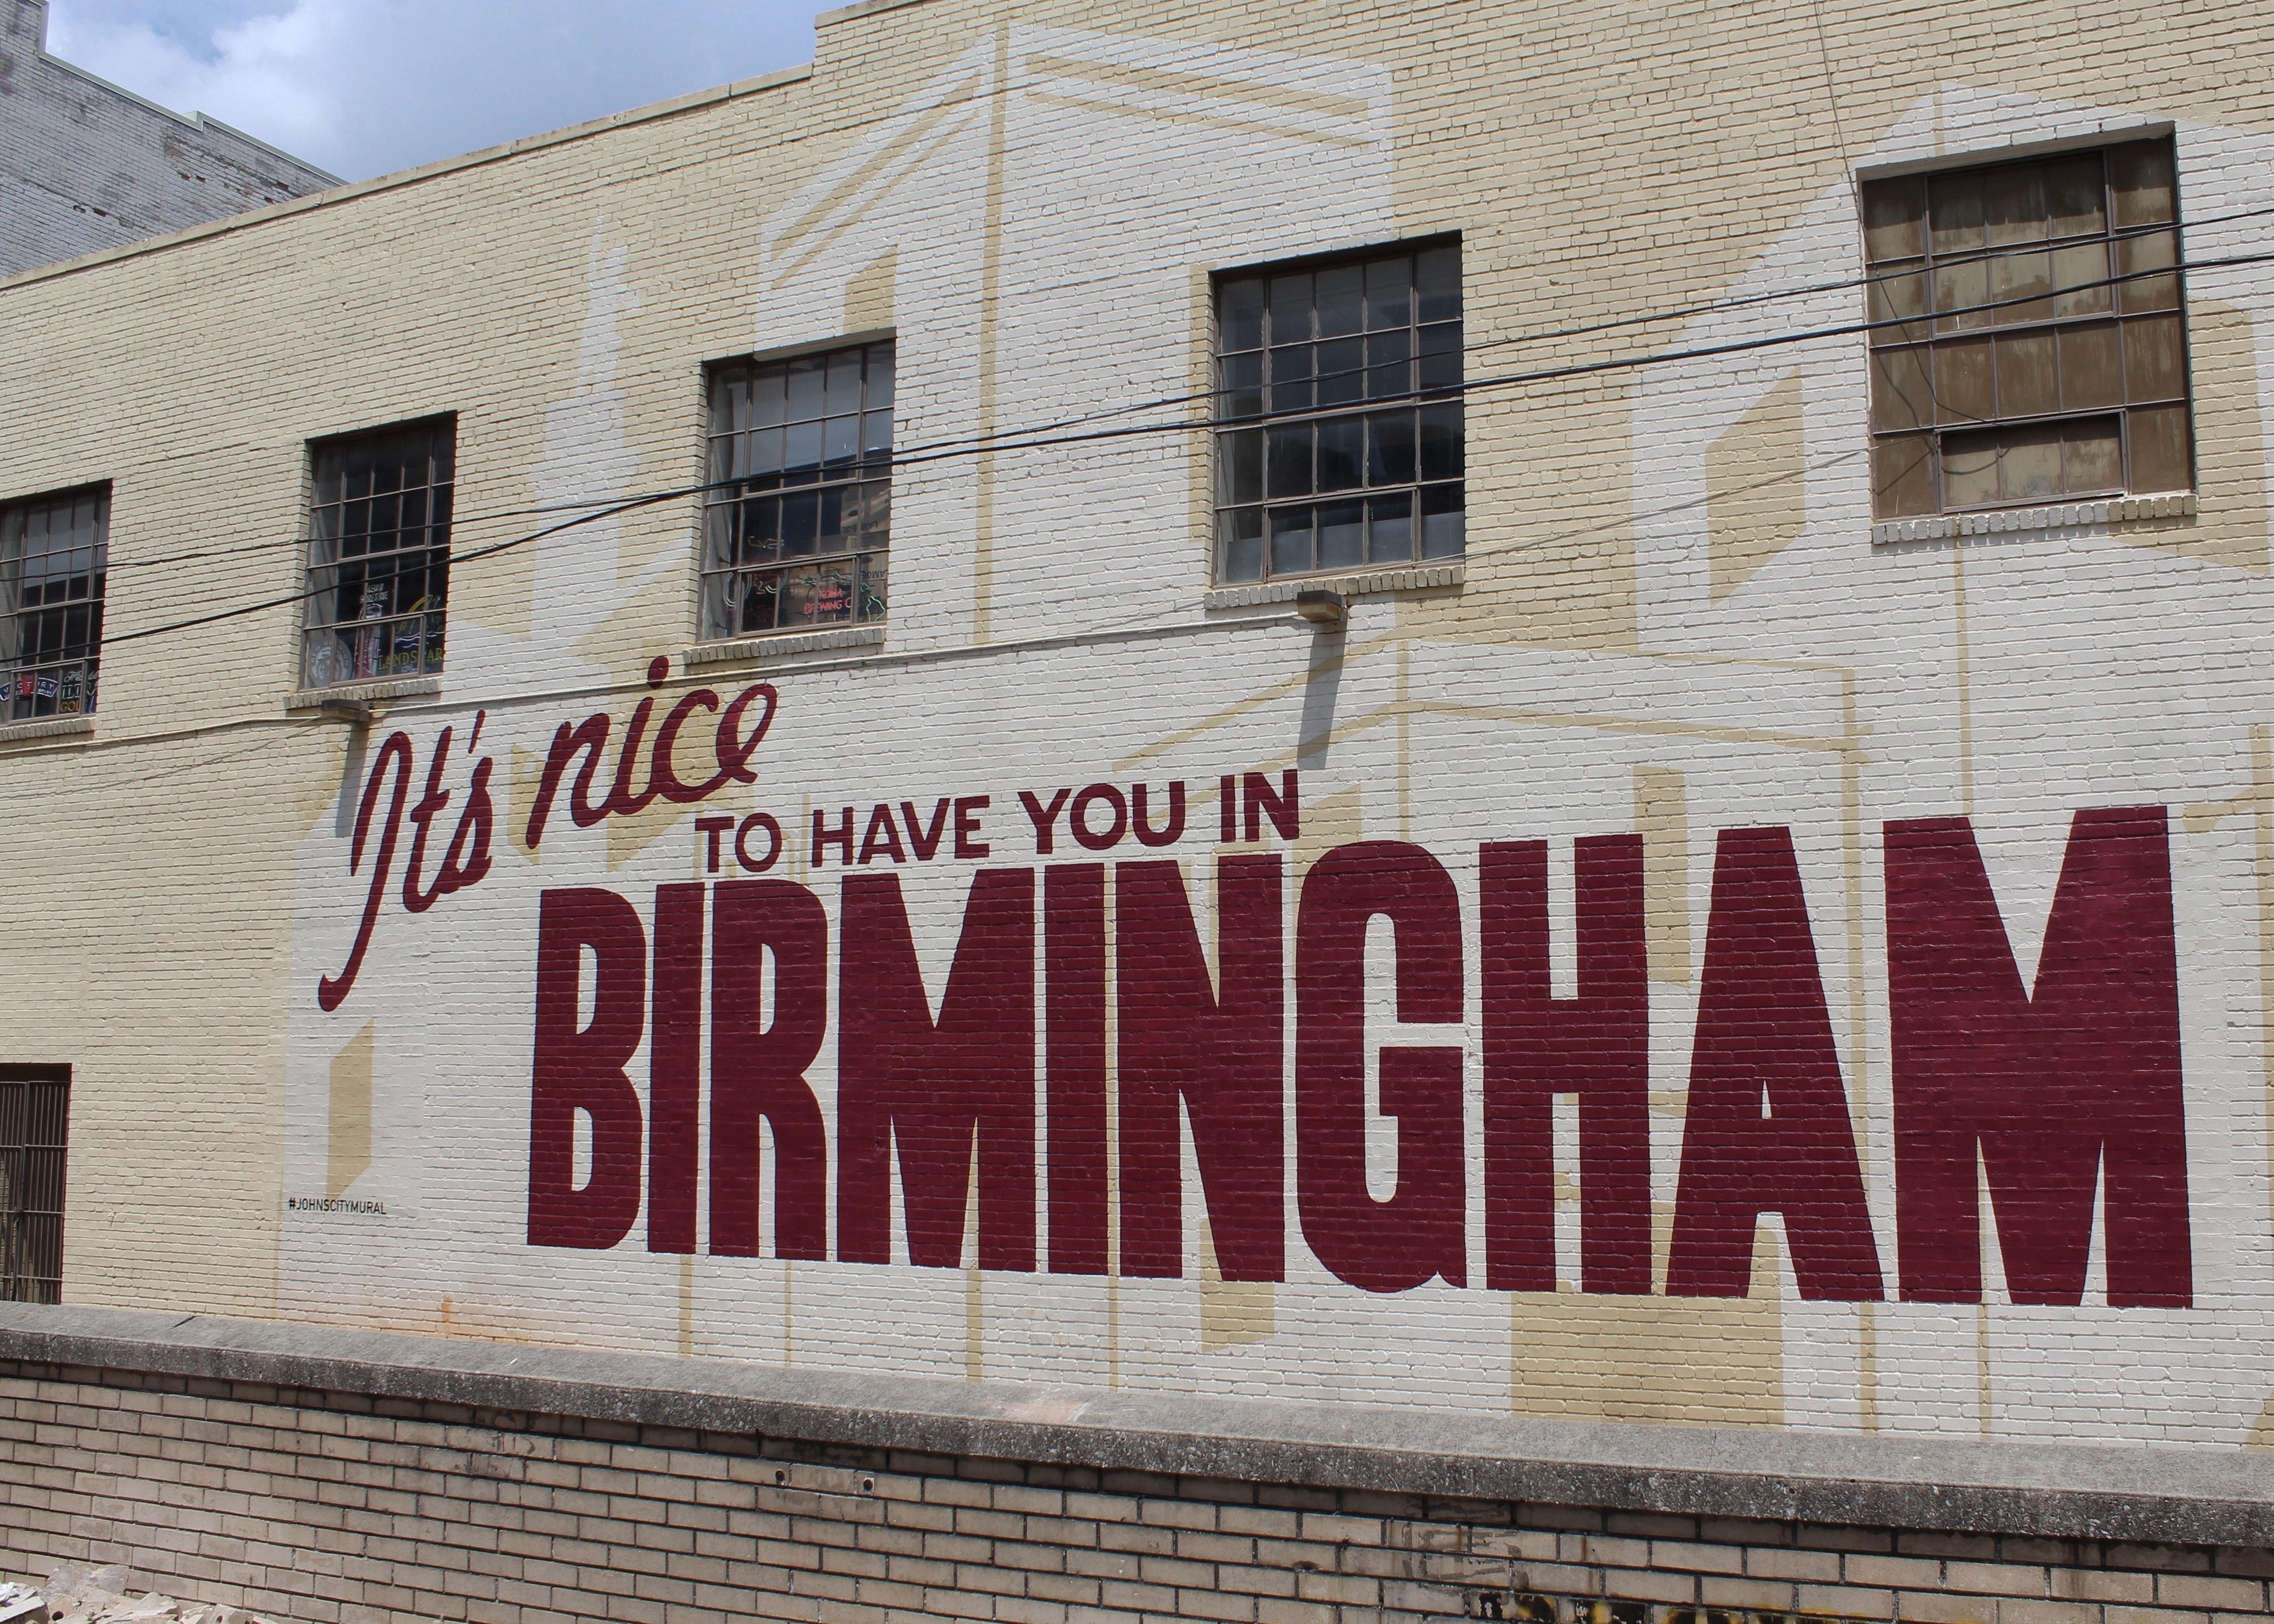 10 Stylish Date Ideas In Birmingham Al mural on wall of johns city diner in downtown birmingham alabama 2021